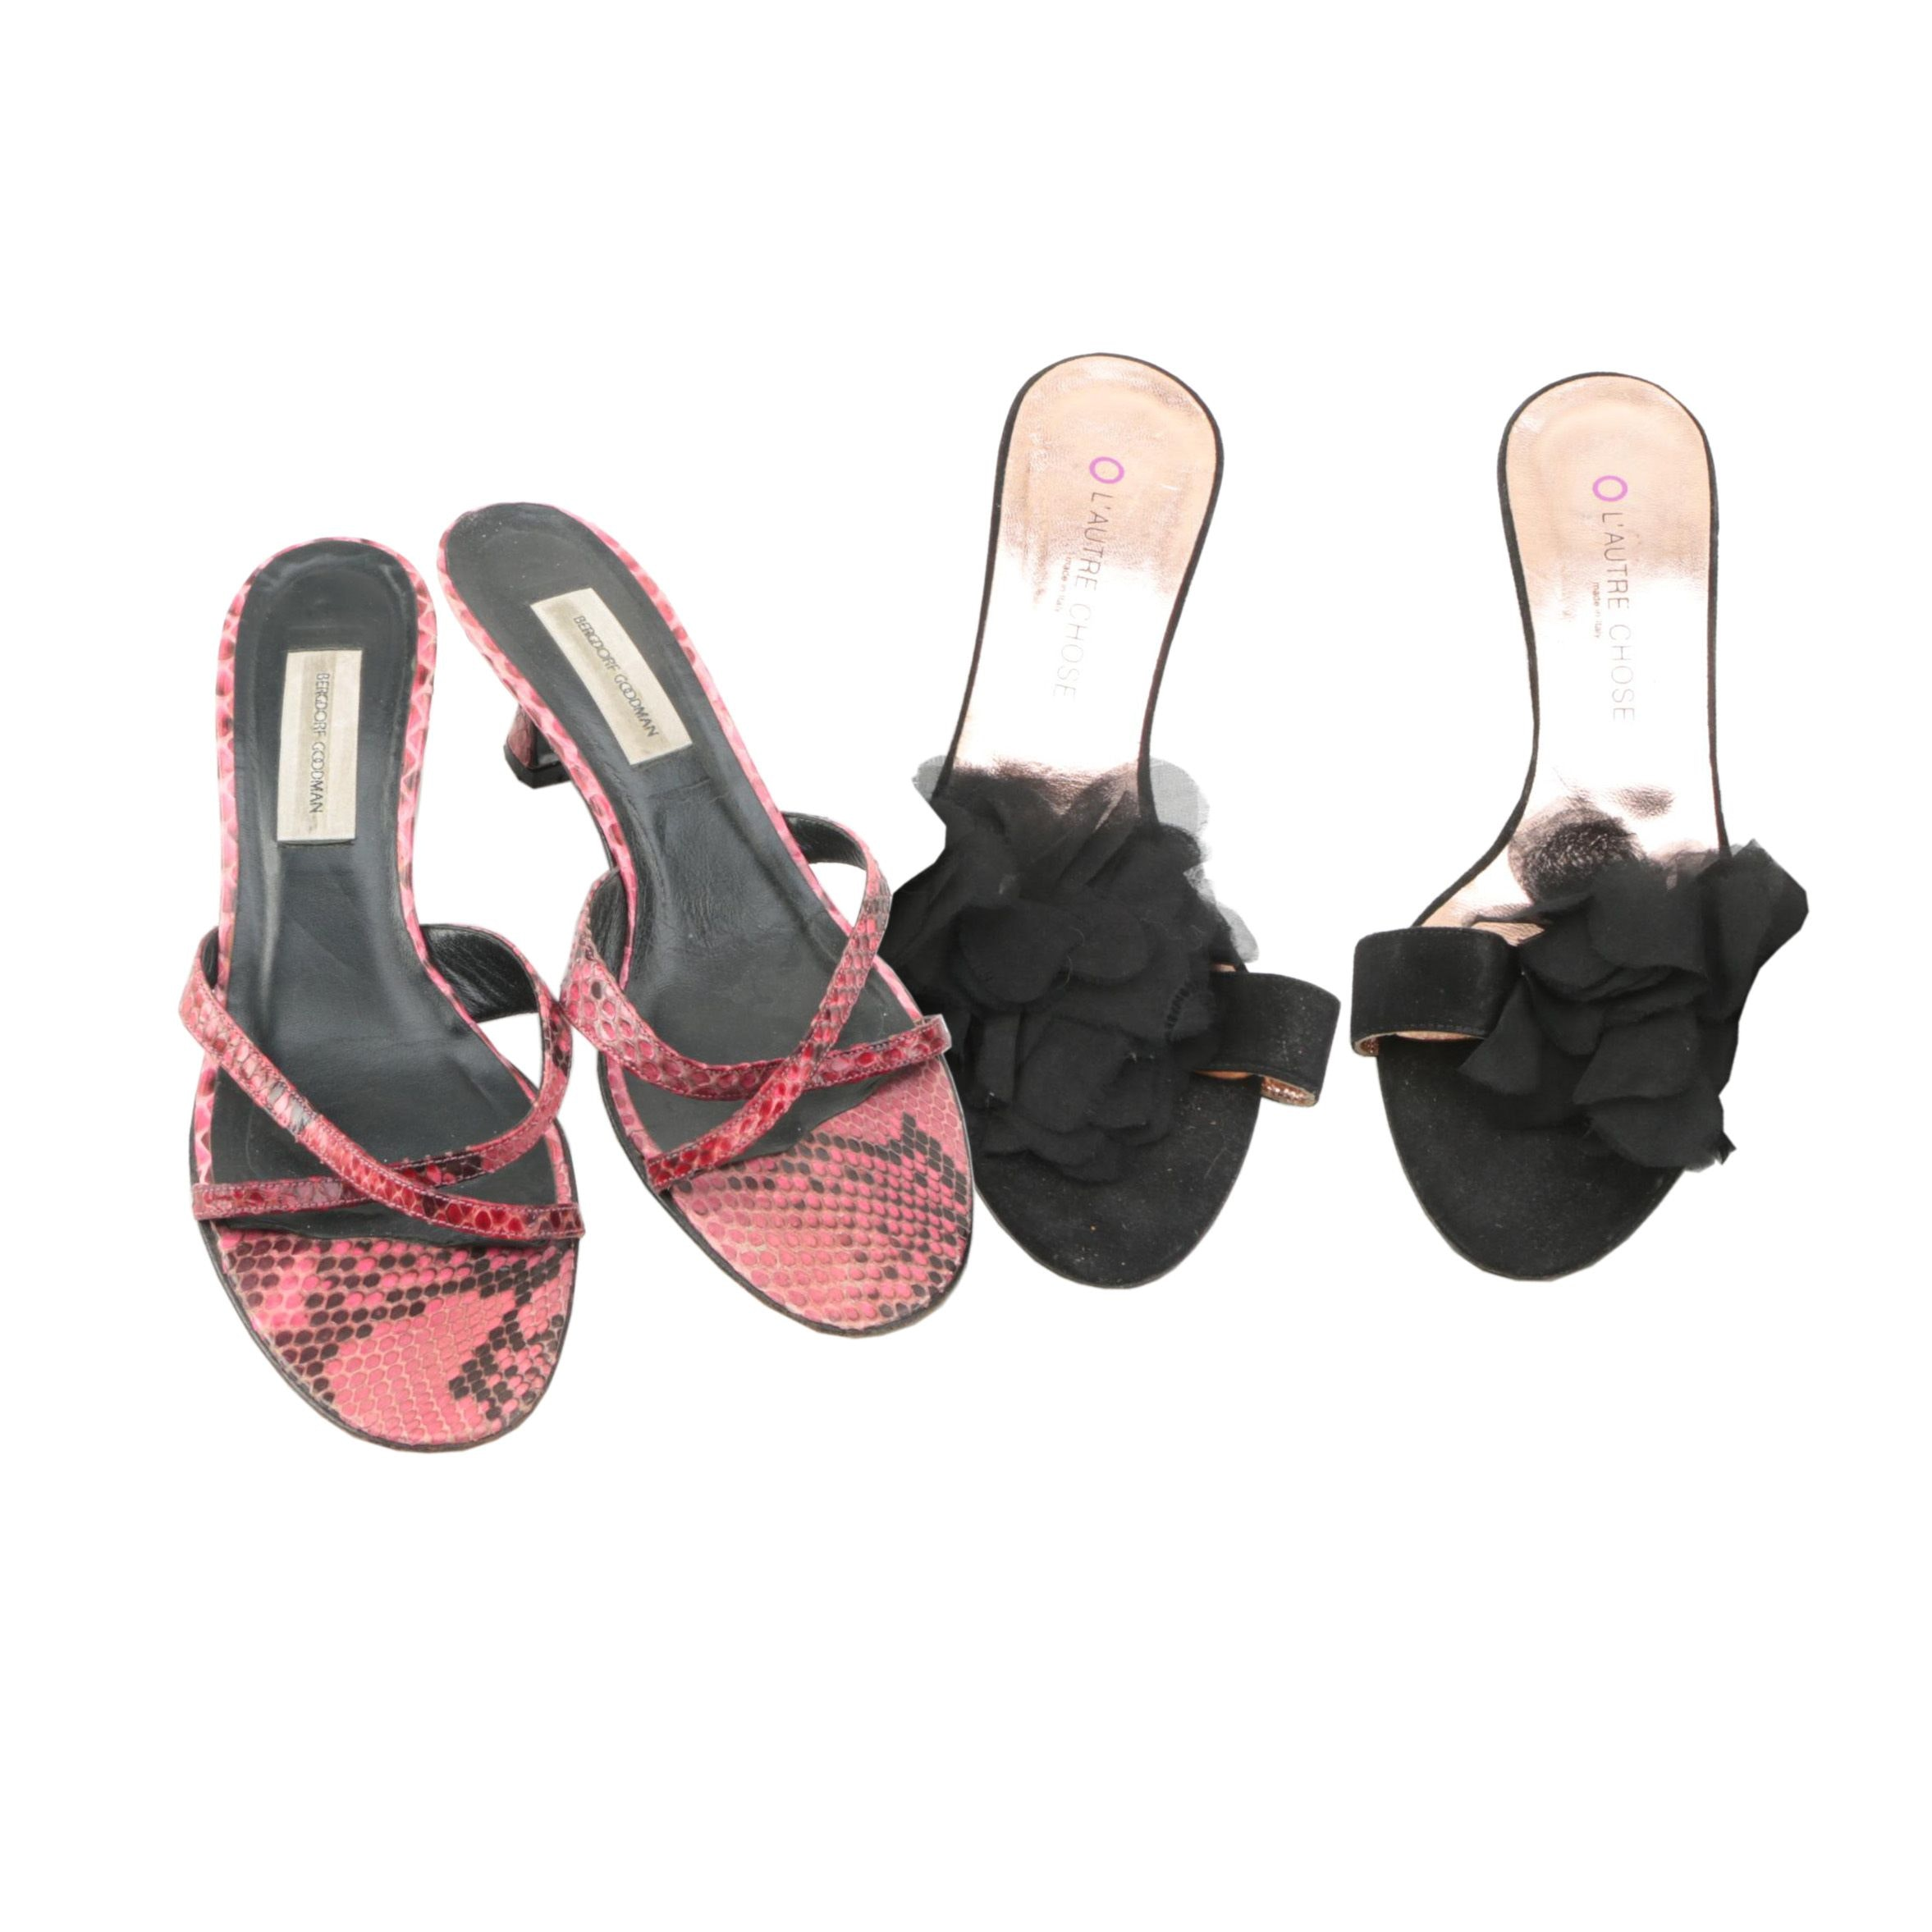 Kitten Heeled Sandals